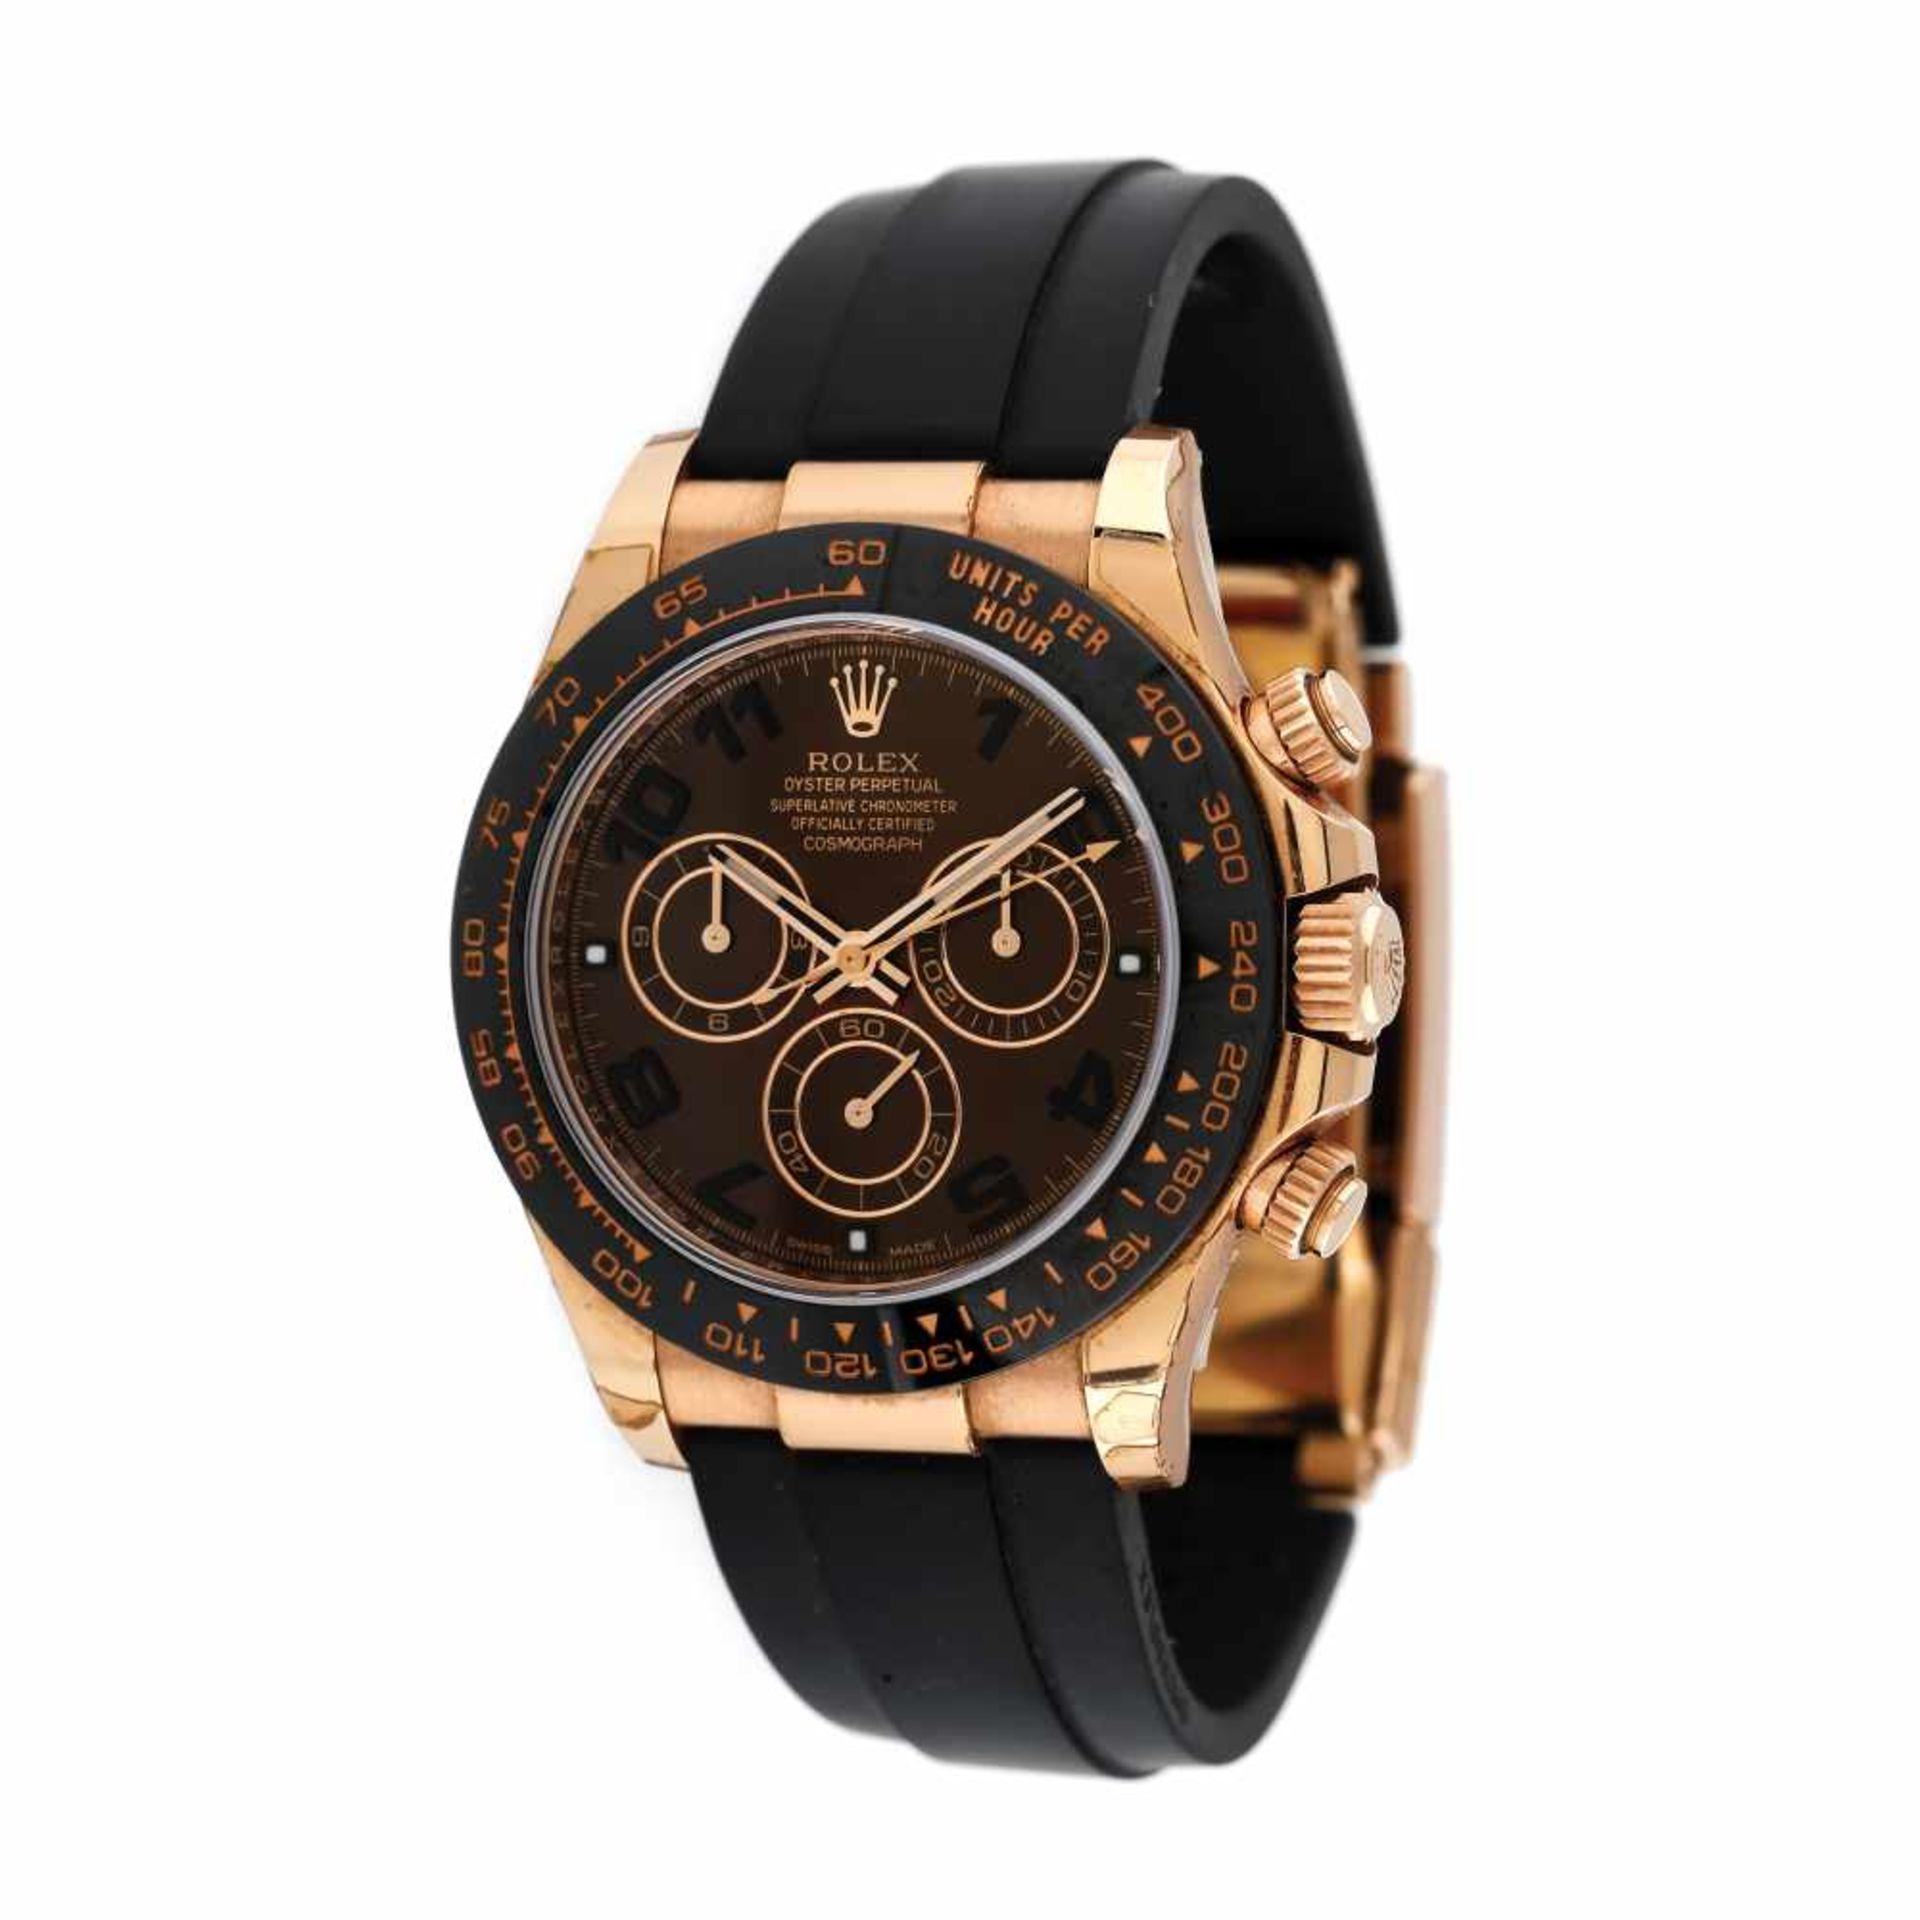 Rolex Daytona wristwatch, rose gold, unisex, original box